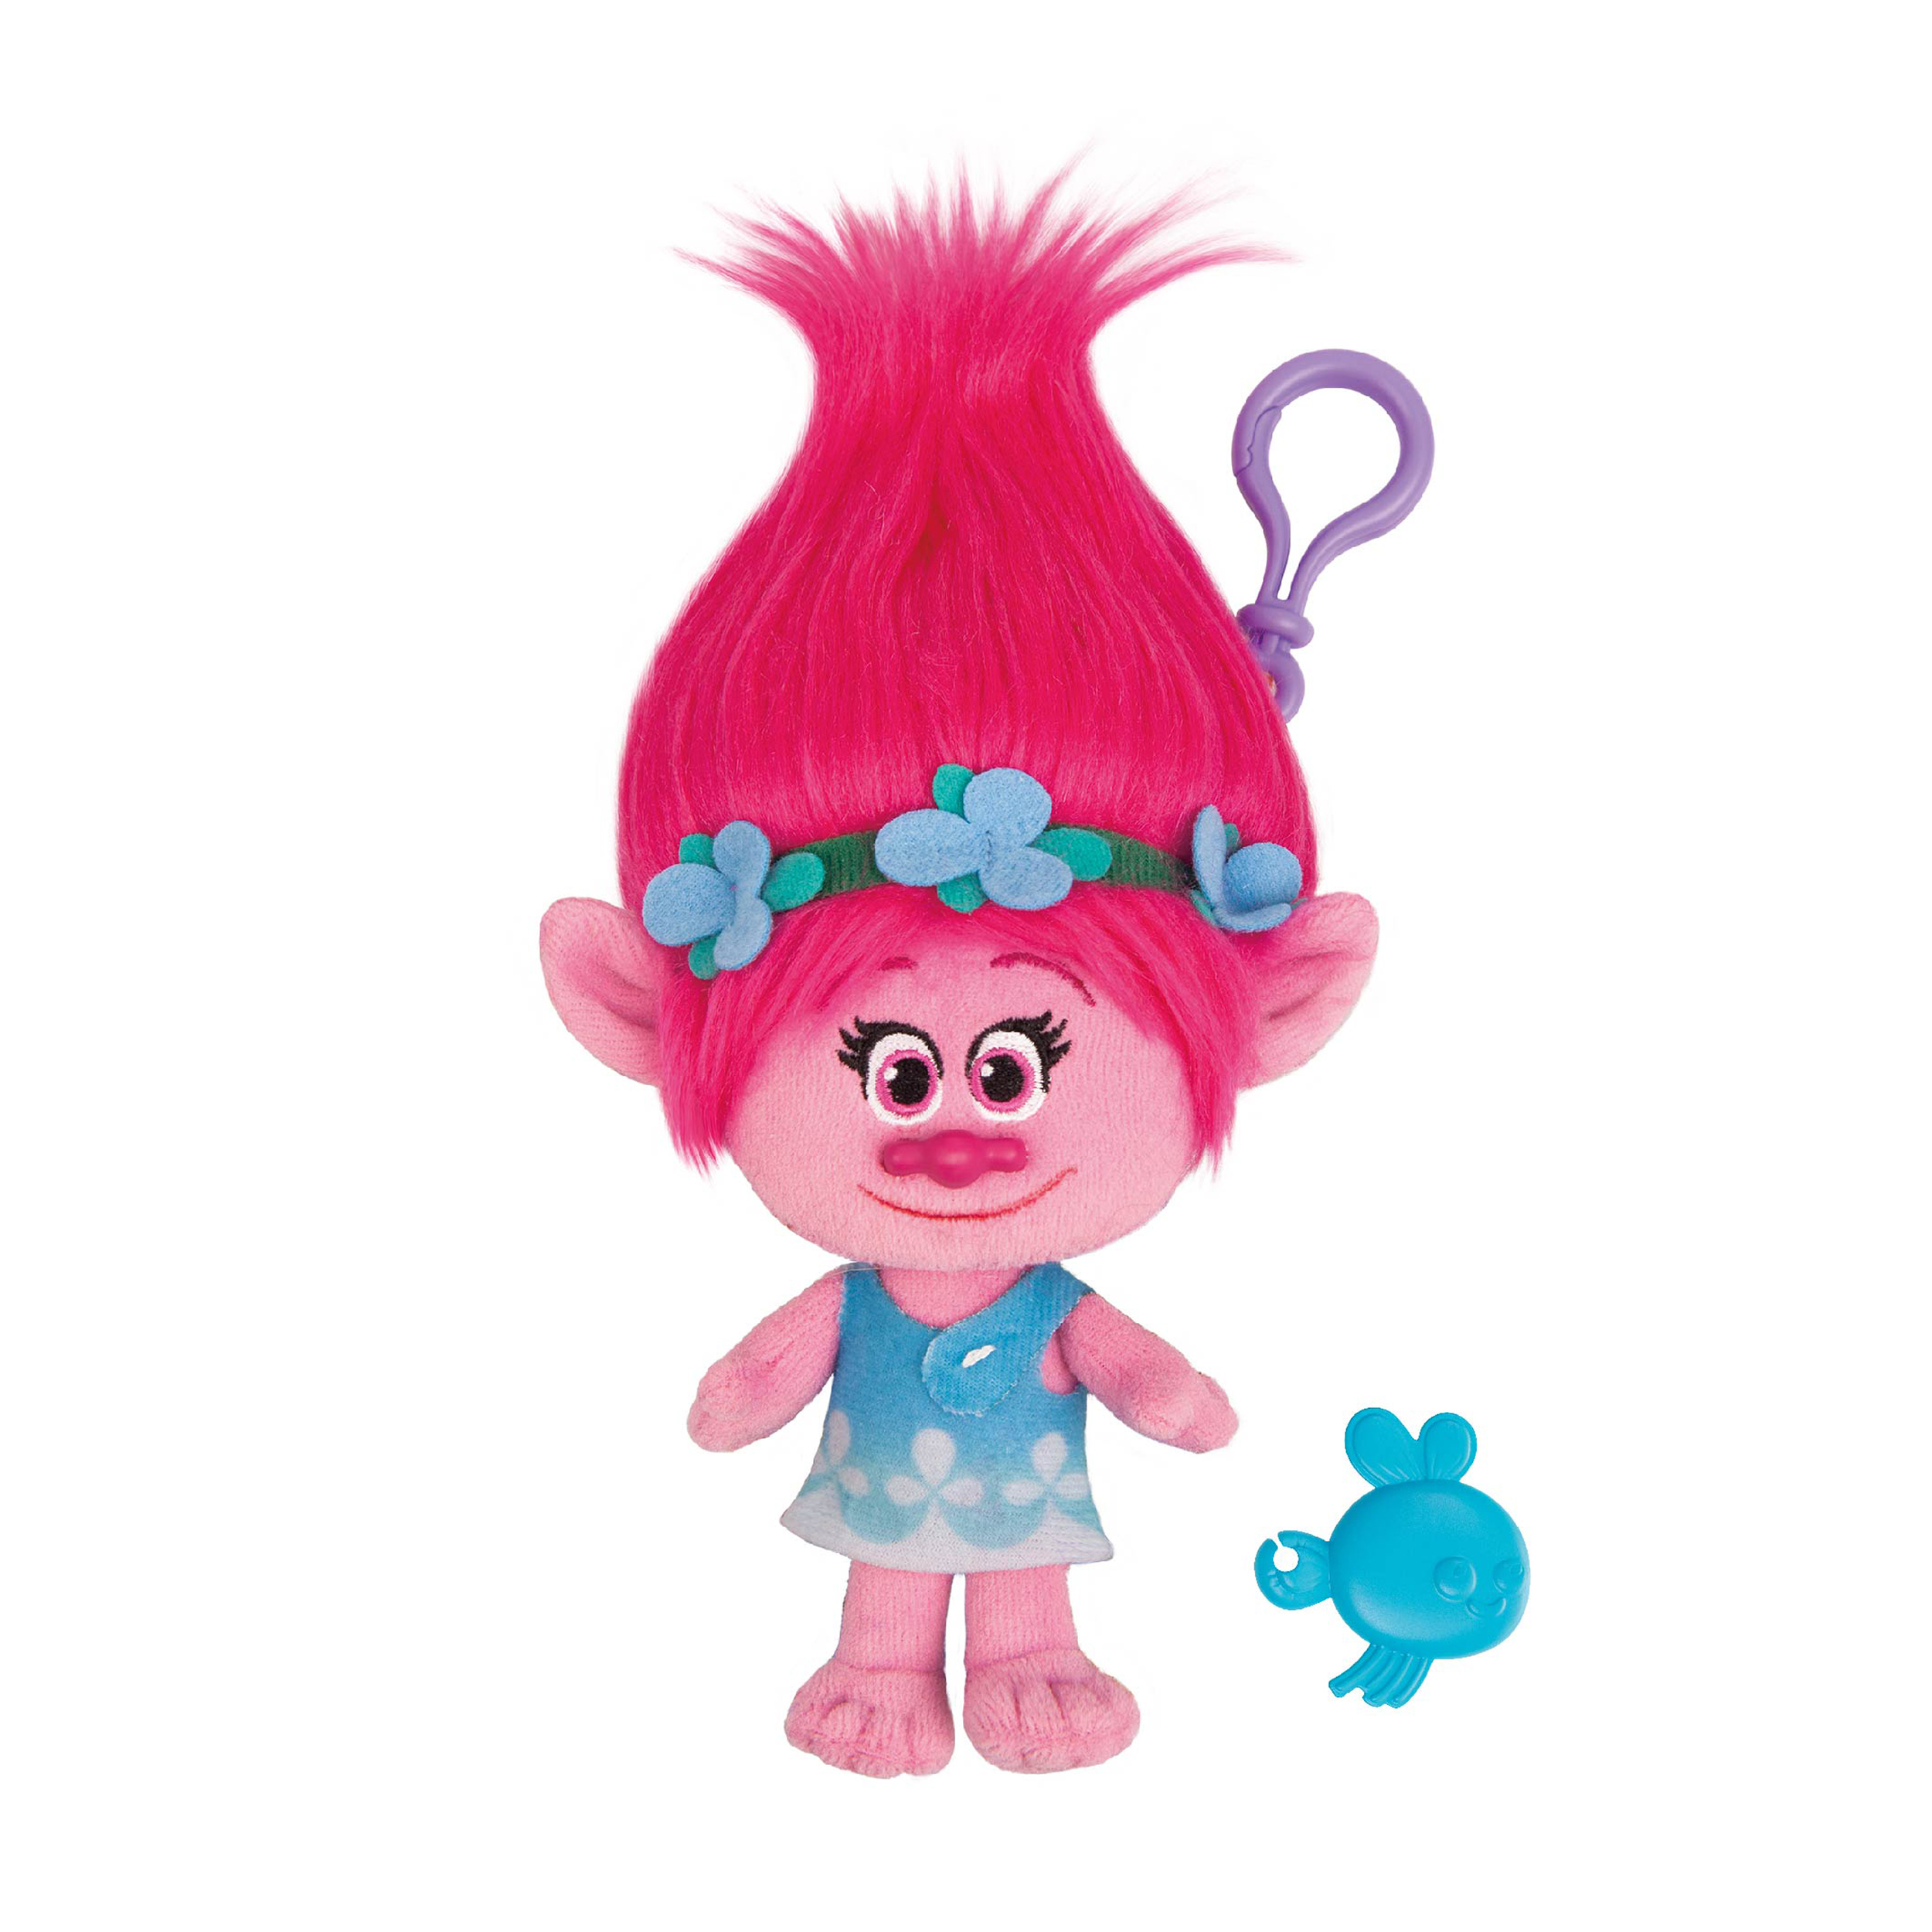 Figurina breloc Trolls - Poppy, 22 cm